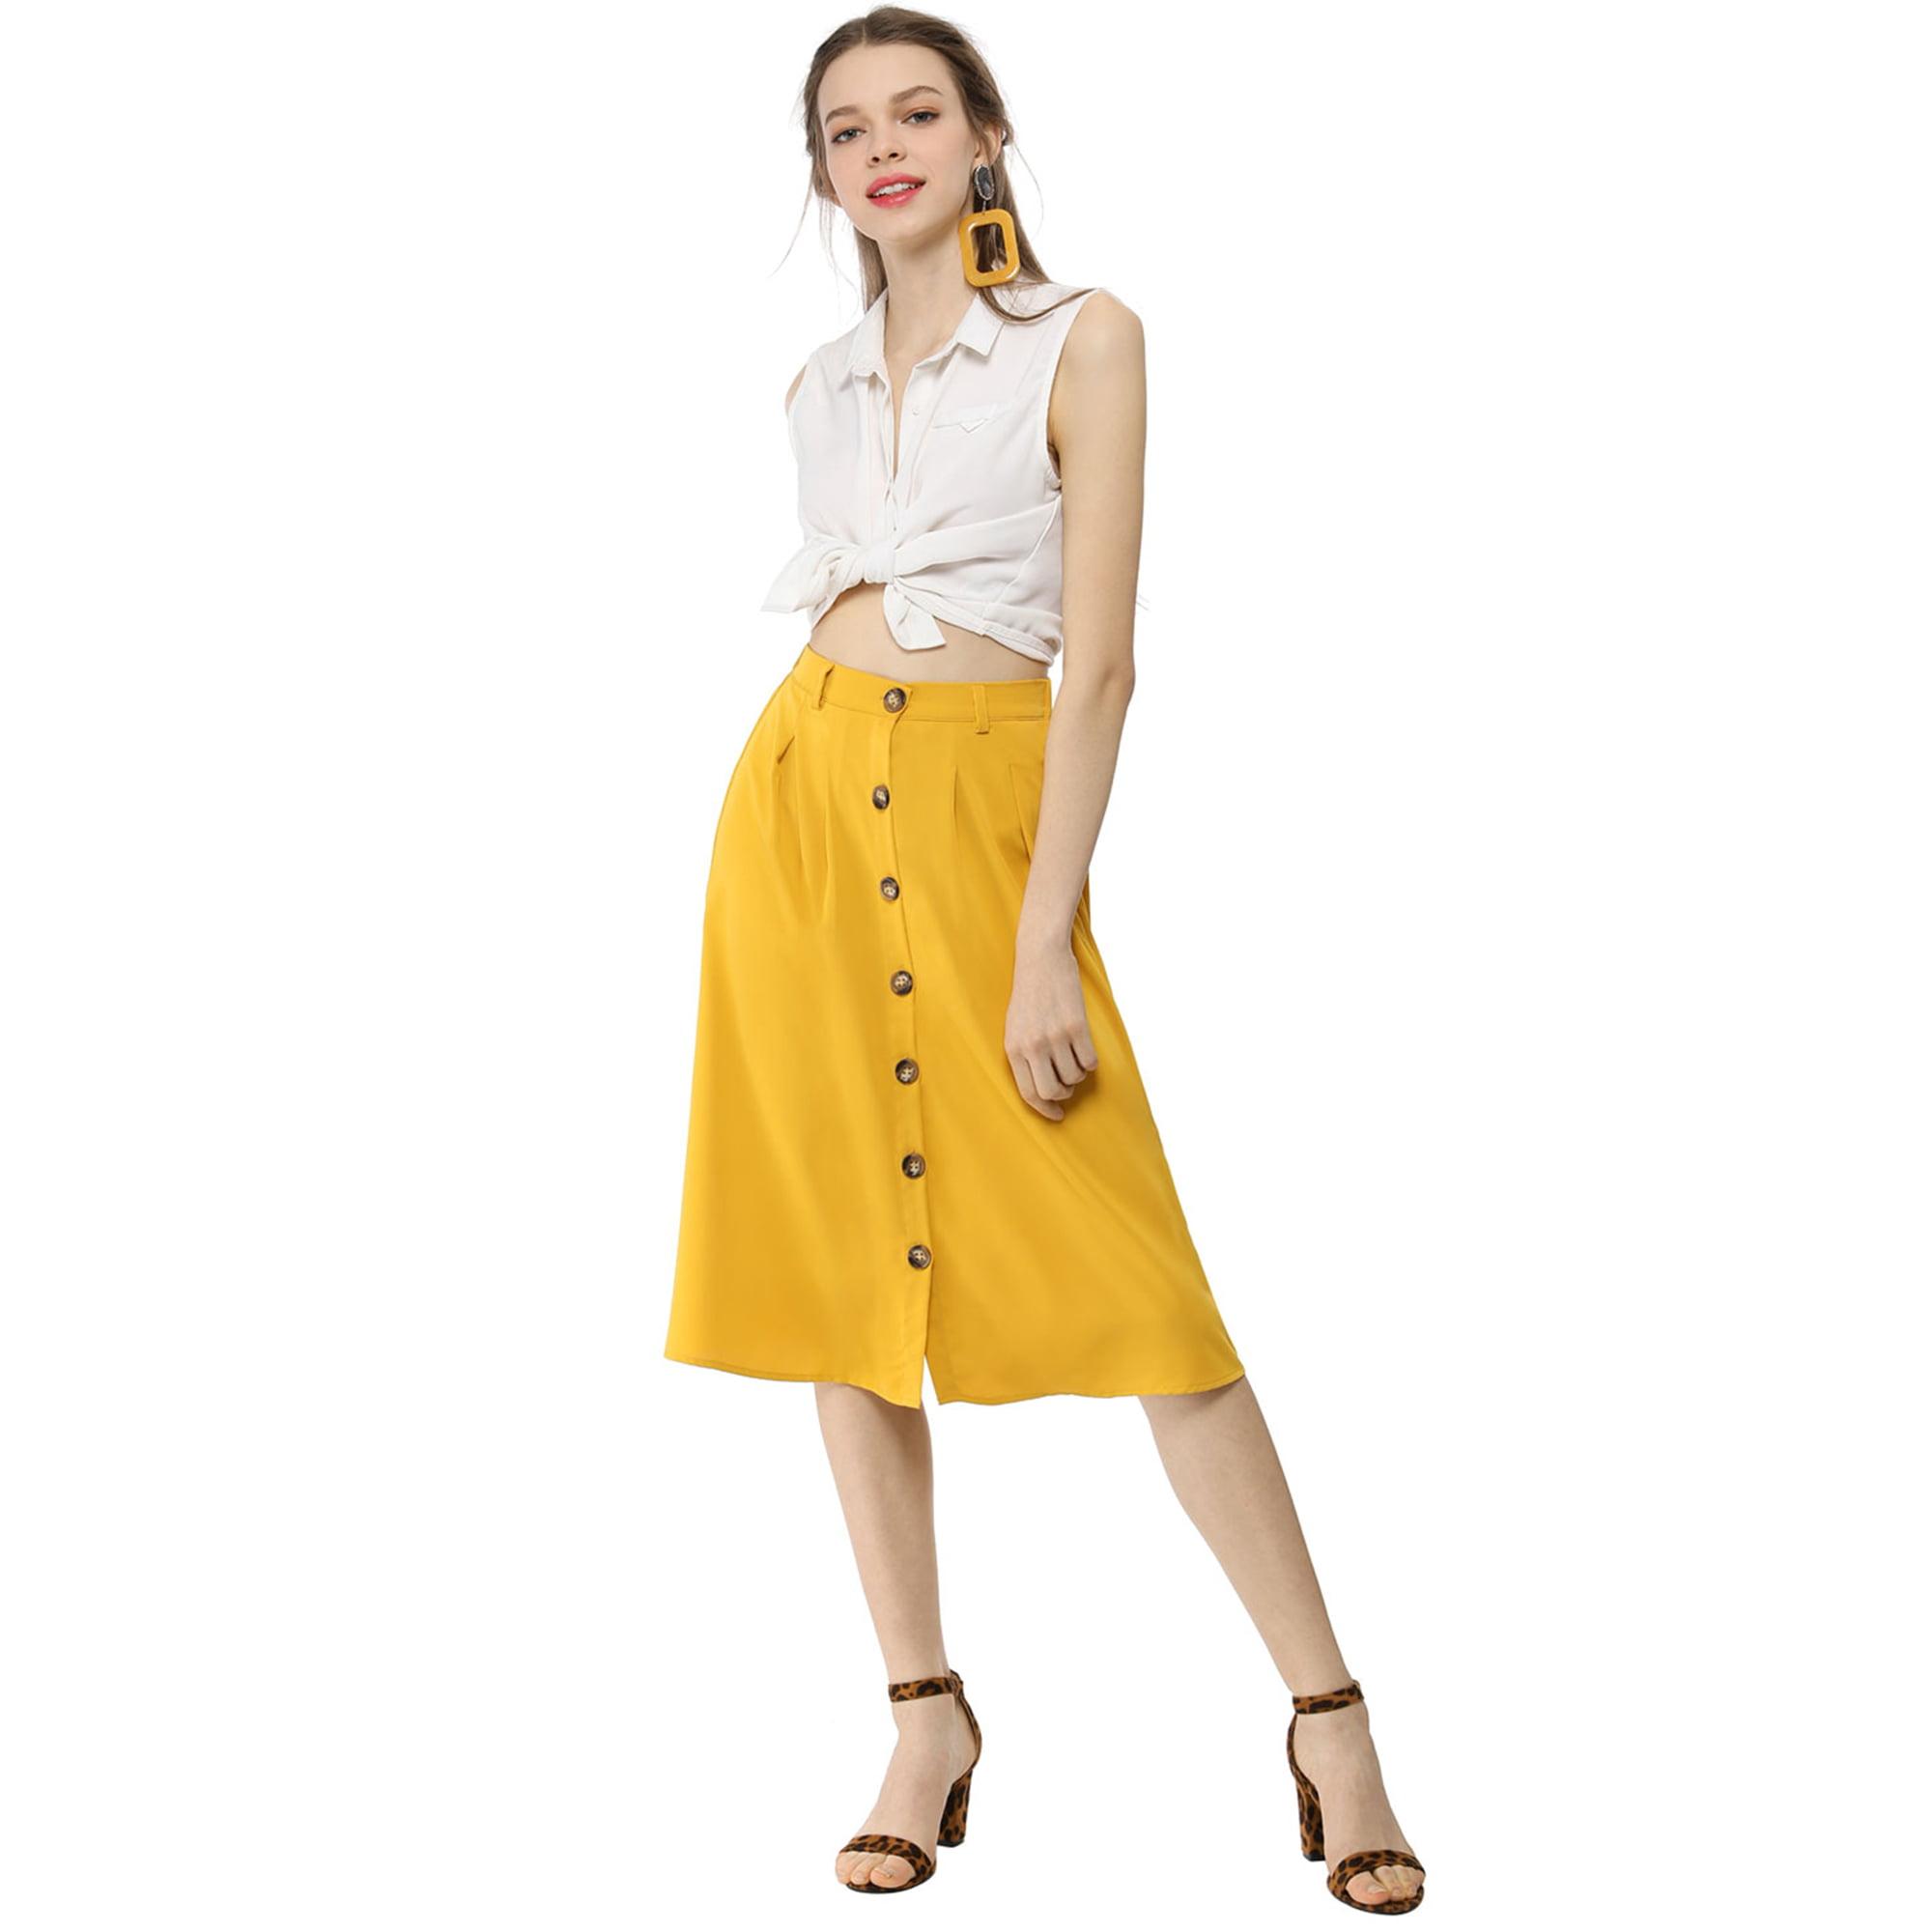 c39293bac High Waist Midi Skirt Flare | Saddha